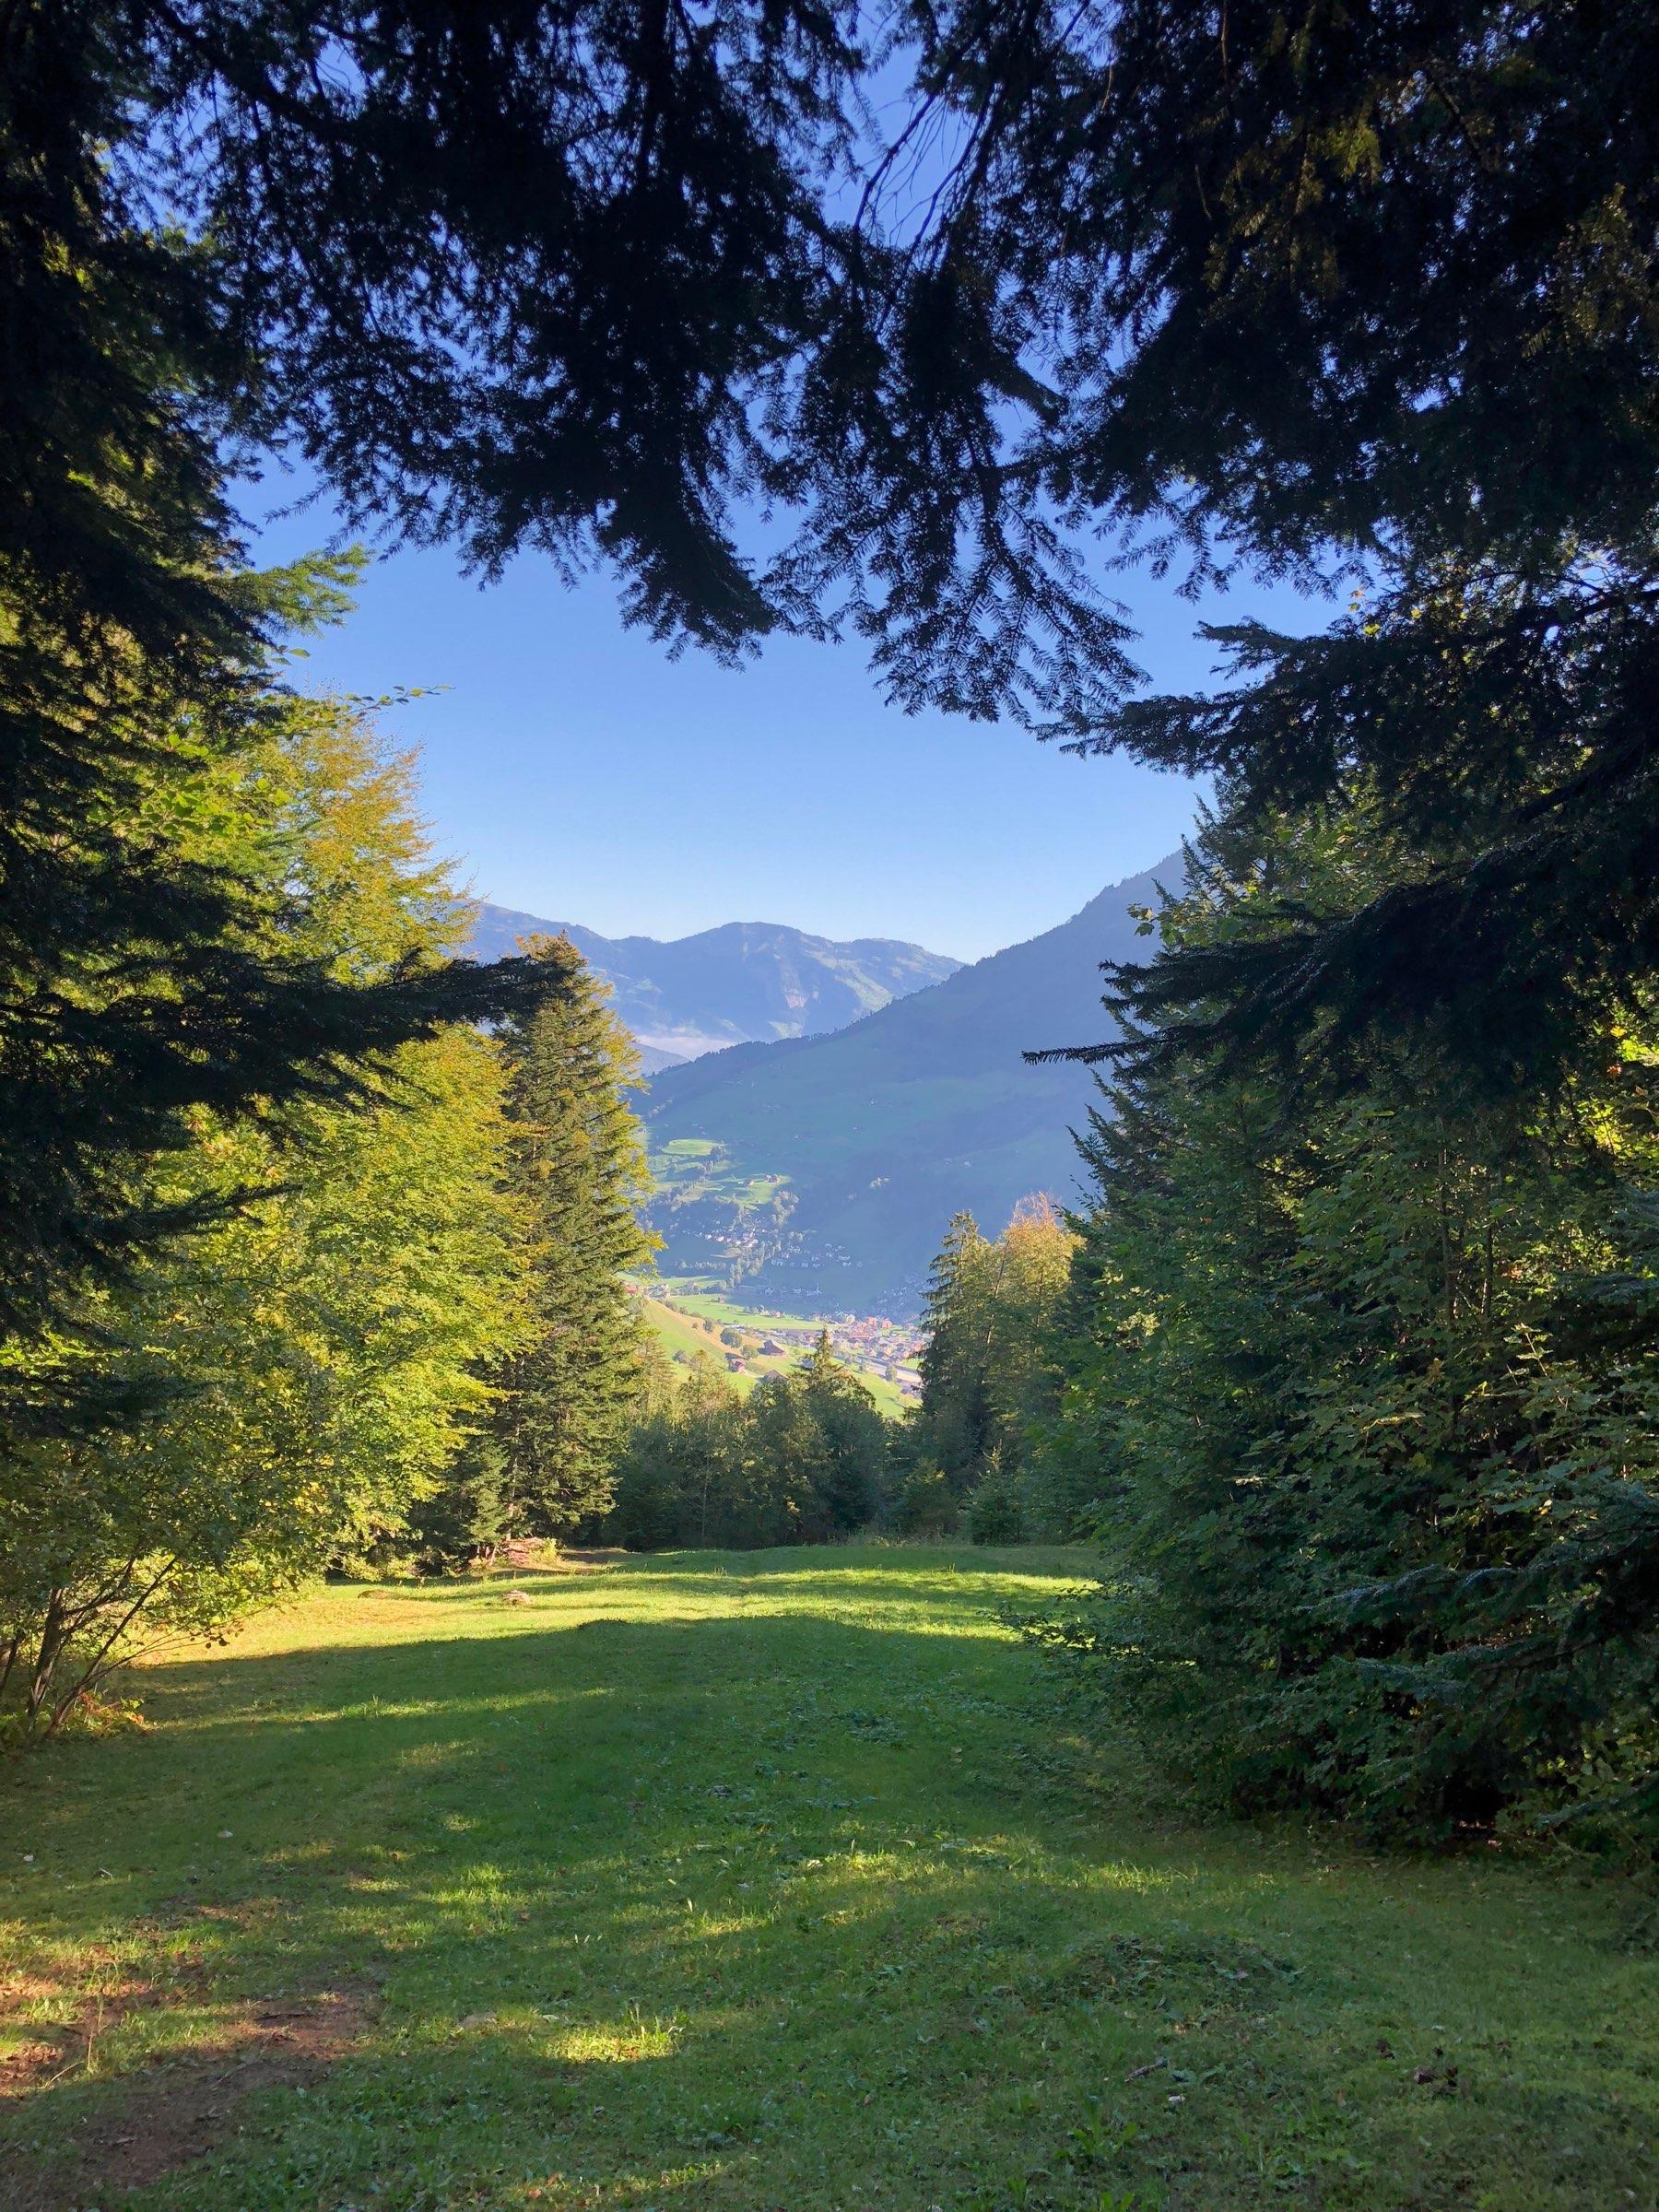 Wirzweli hike – Mark Pospesel (Coding and Other Stuff)